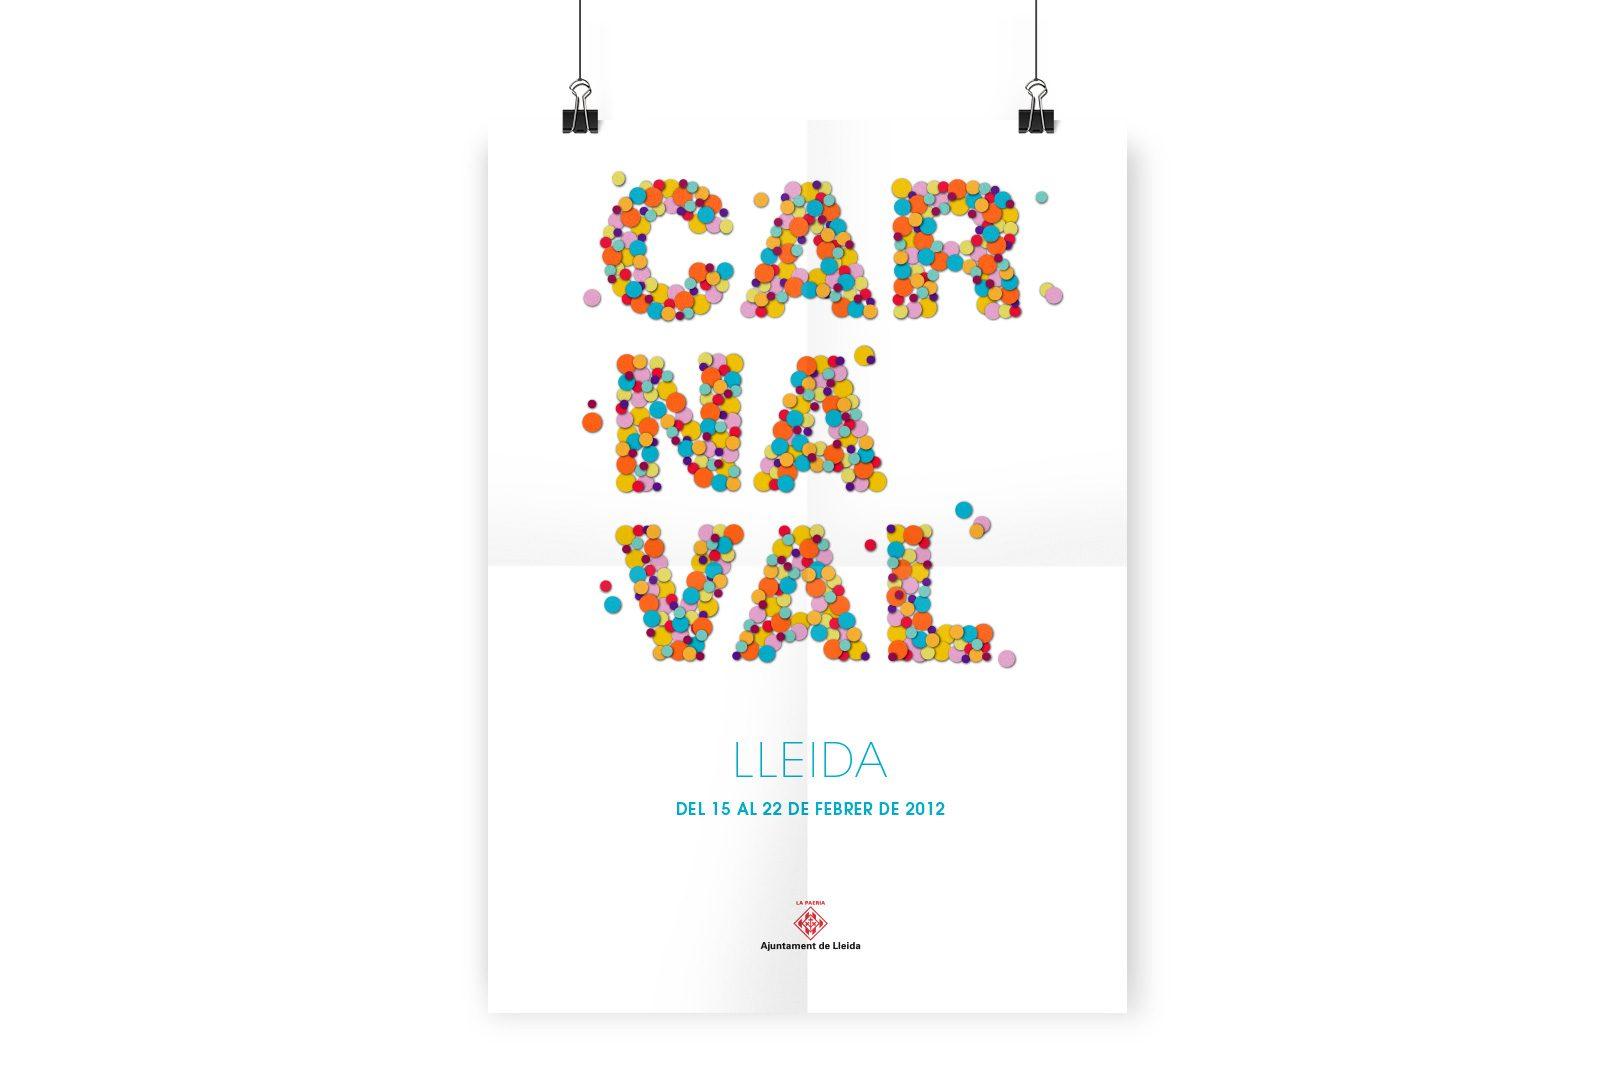 carnaval-lleida-3